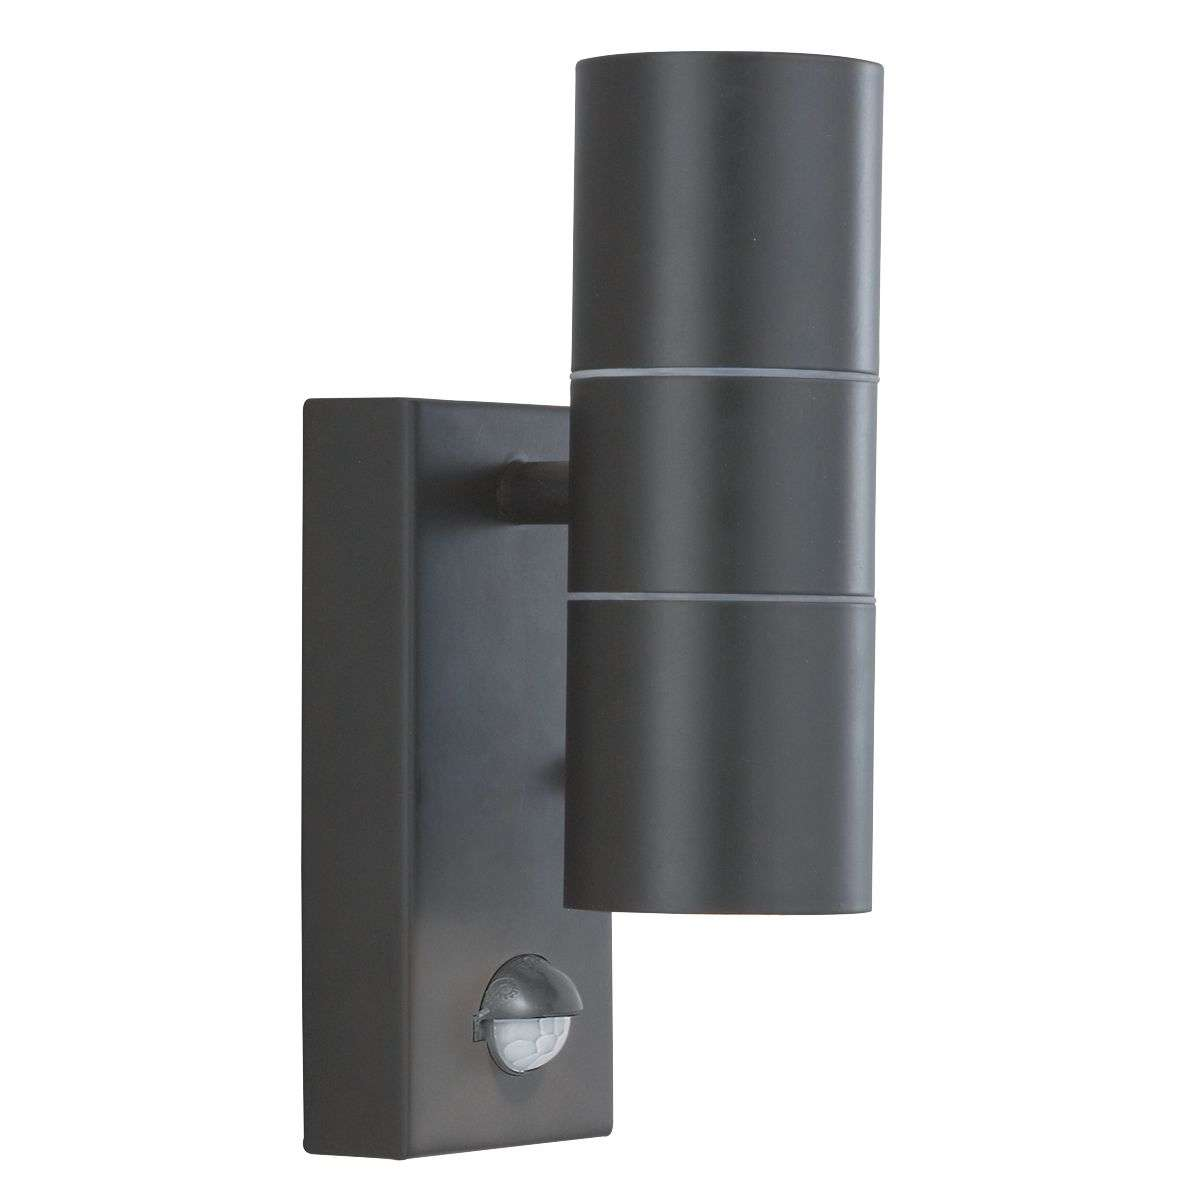 6W LED 2 Light Black Wall Light with Motion Sensor